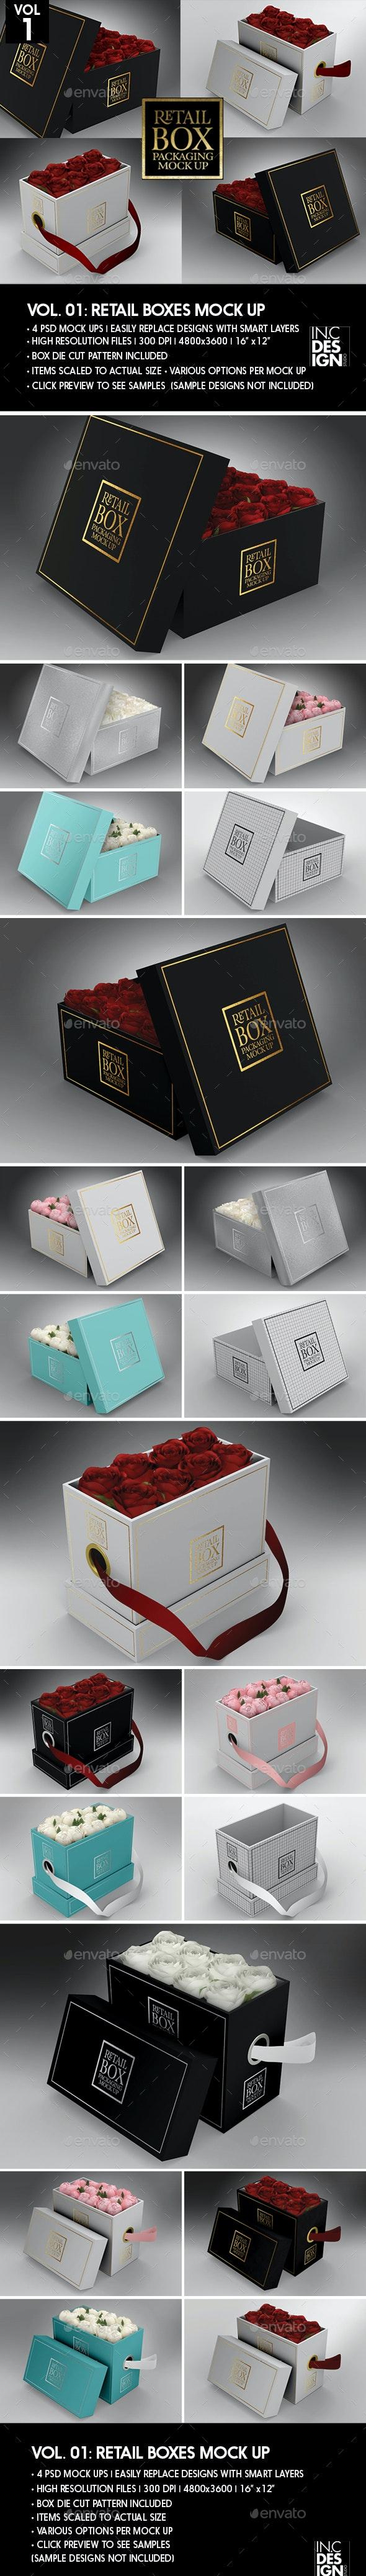 Retail Boxes Vol.1: Box Packaging Mock Ups - Packaging Product Mock-Ups